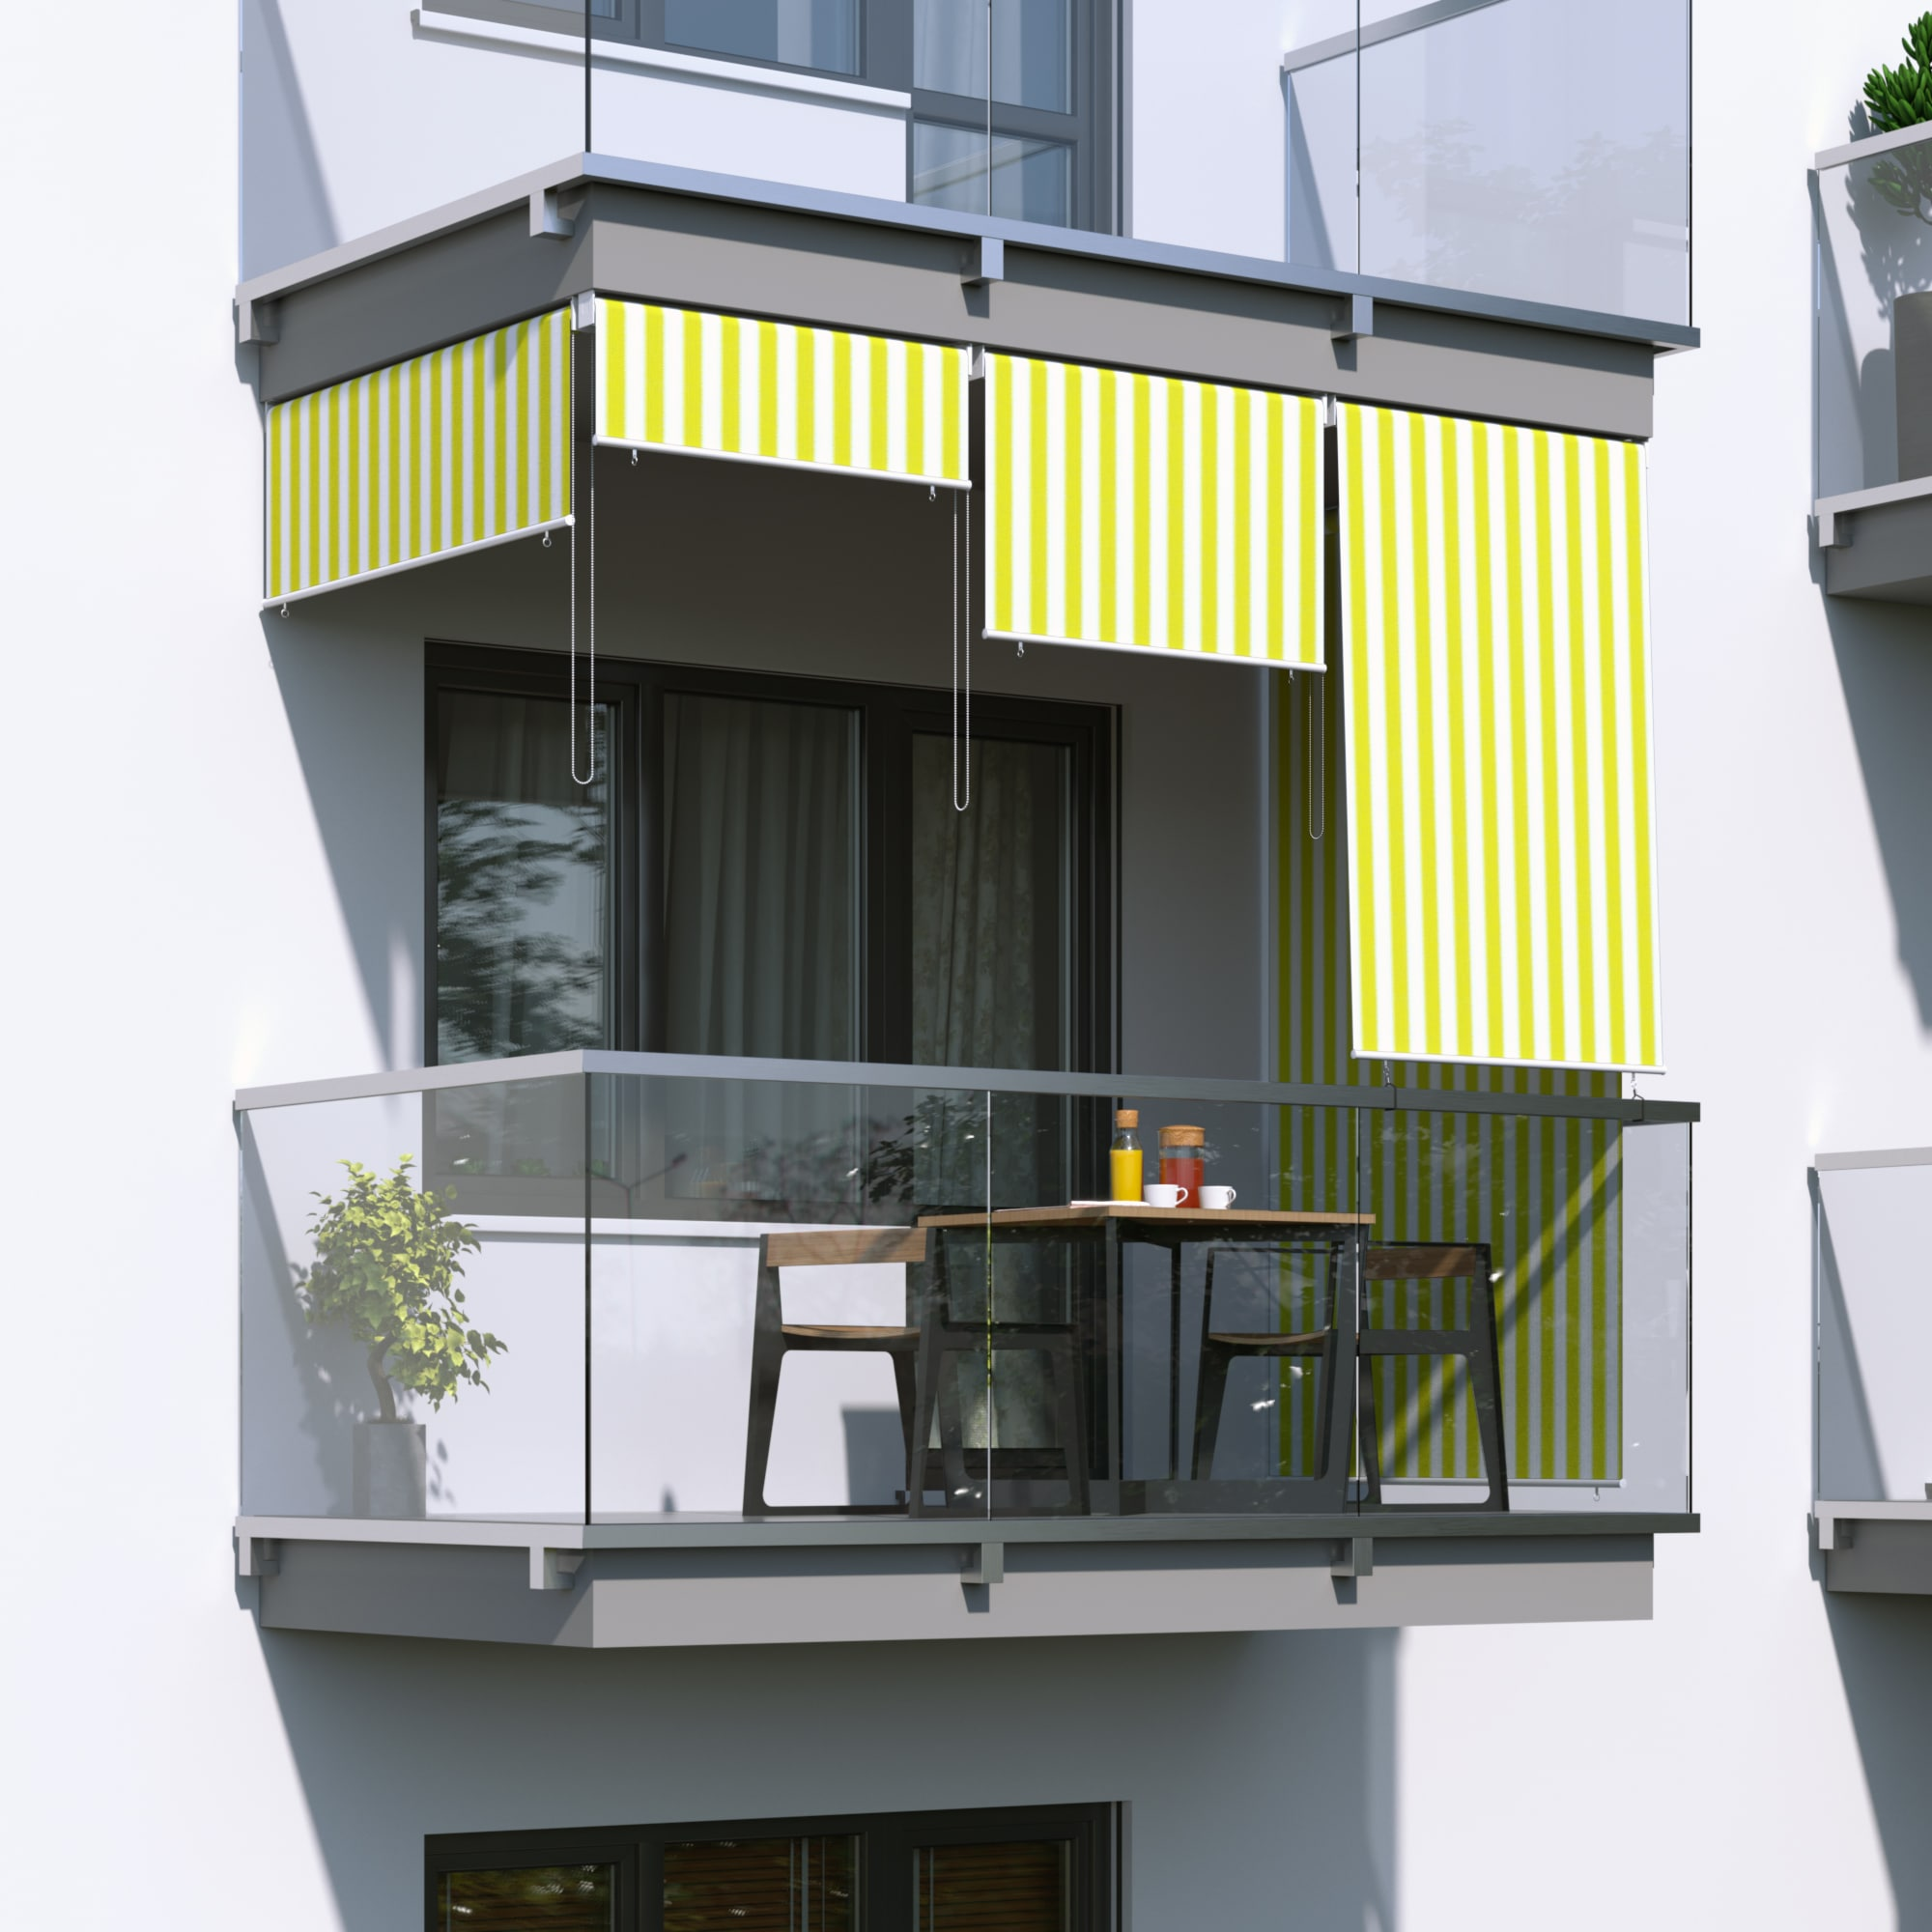 JAROLIFT-Senkrechtmarkise-Sichtschutz-Aussenrollo-Sonnenschutz-Aussen-Rollo-Balkon Indexbild 23